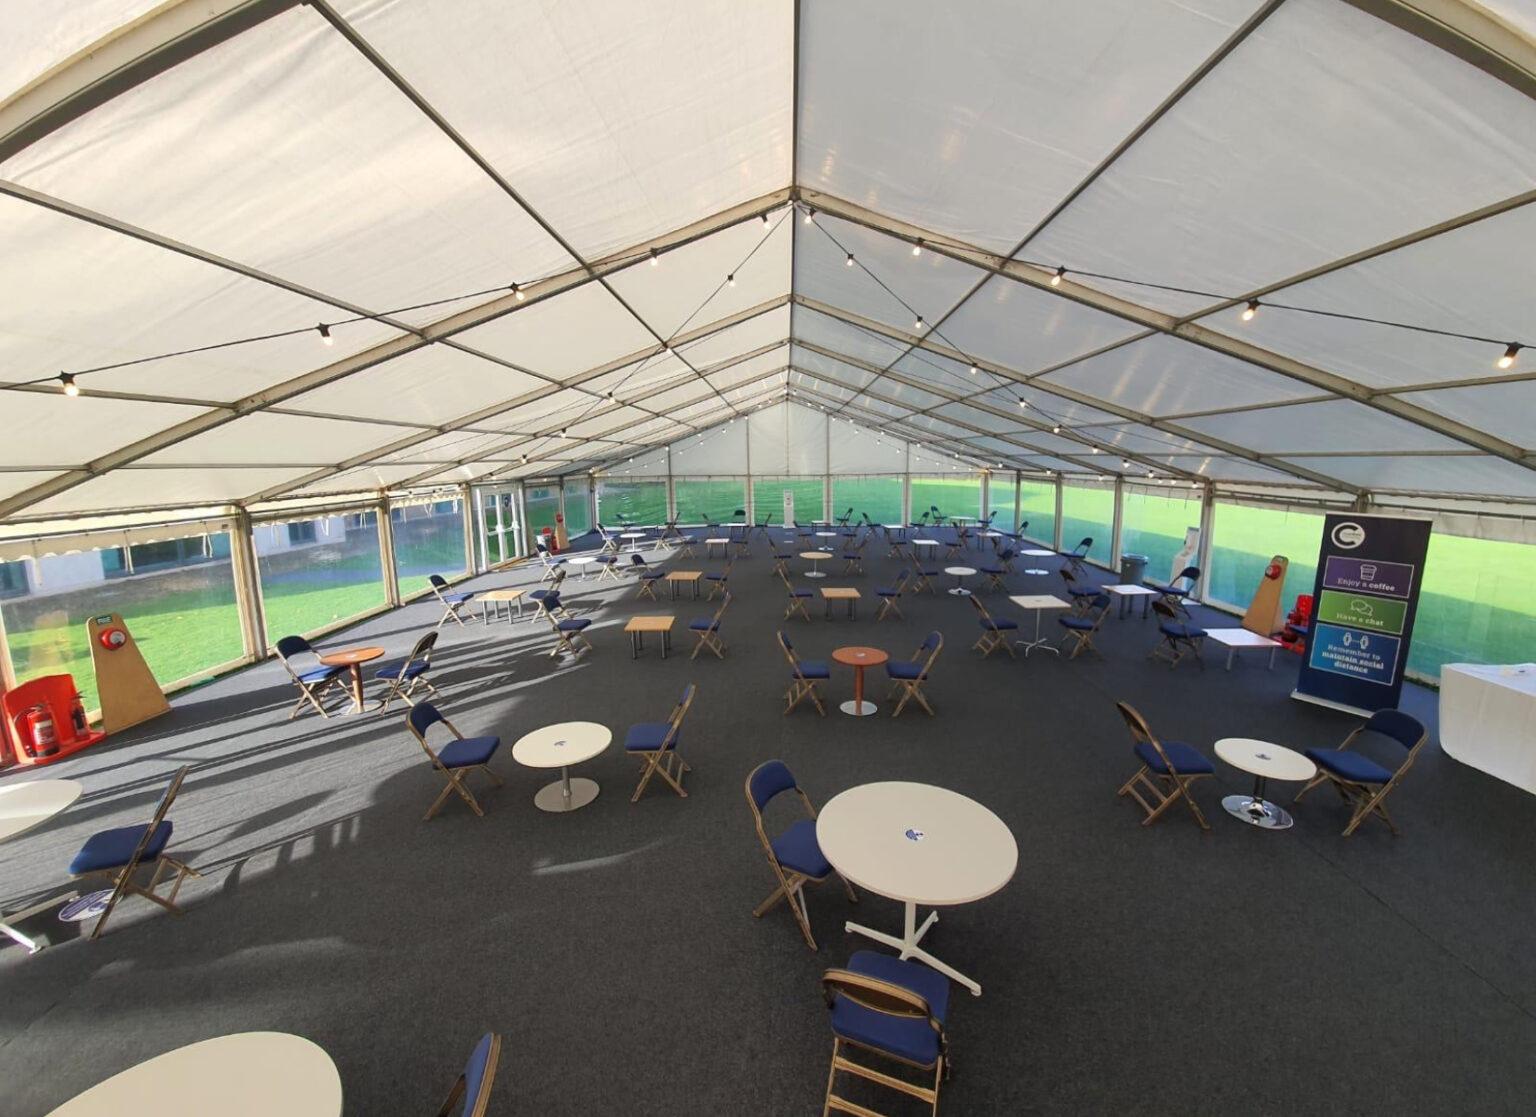 Cranfield University temporary structure